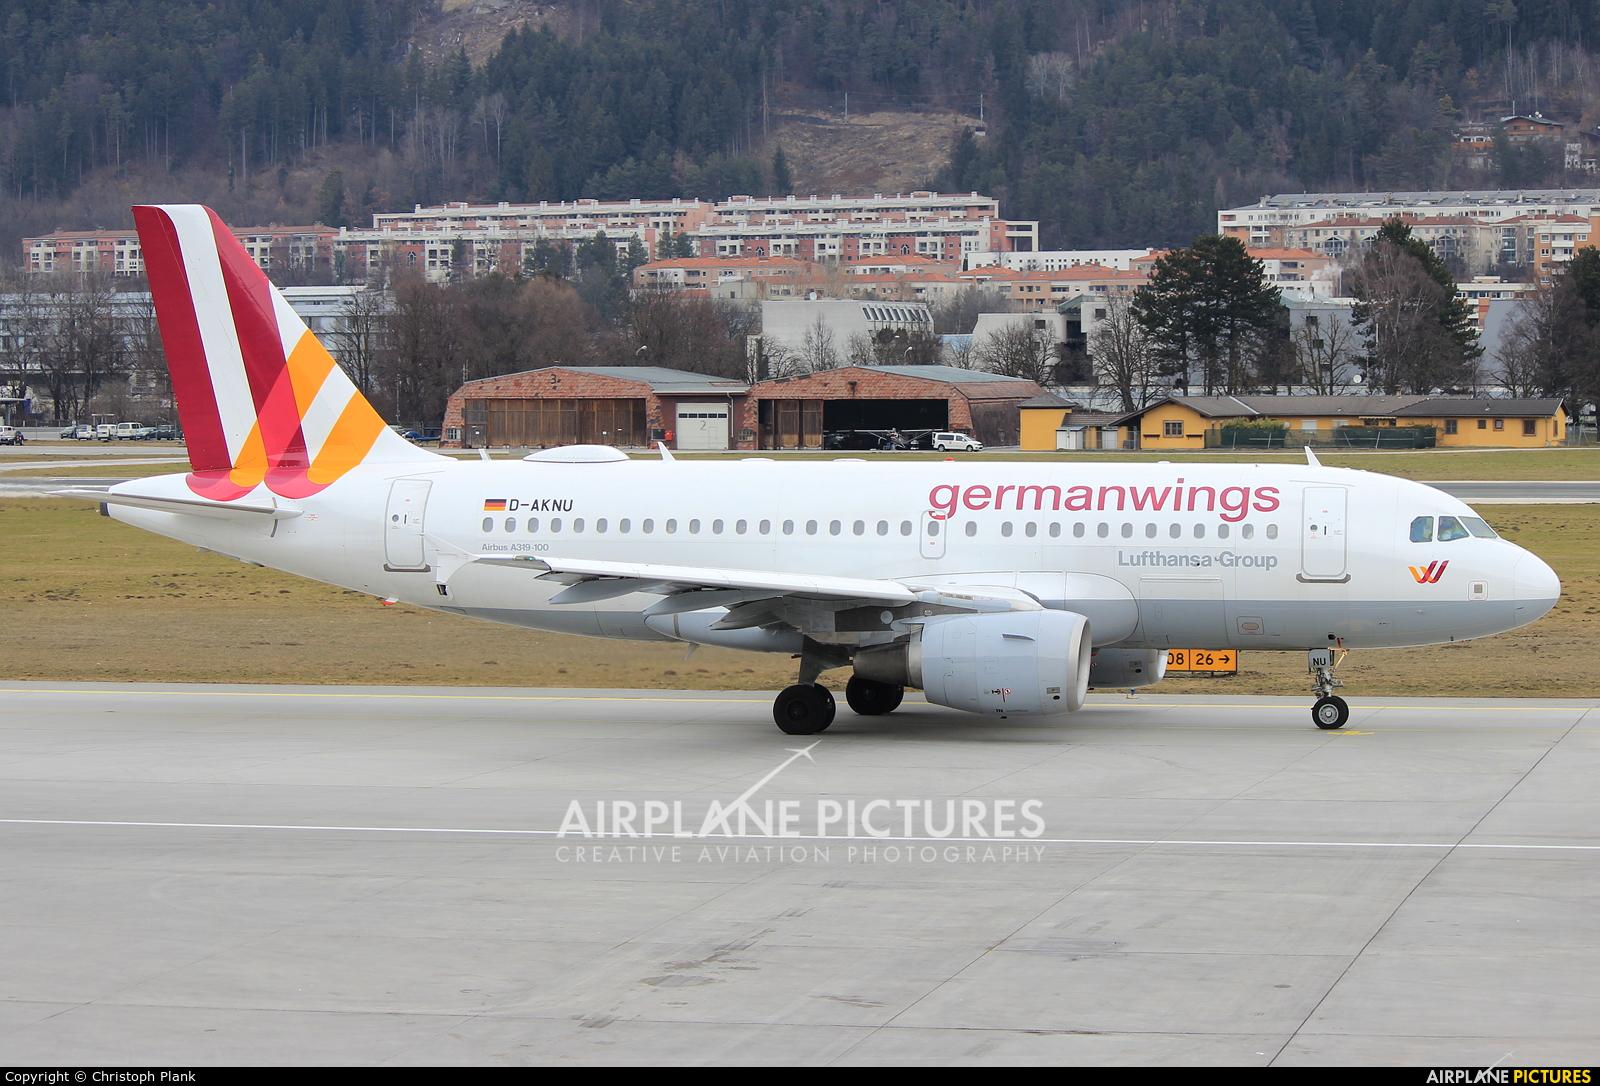 Germanwings D-AKNU aircraft at Innsbruck